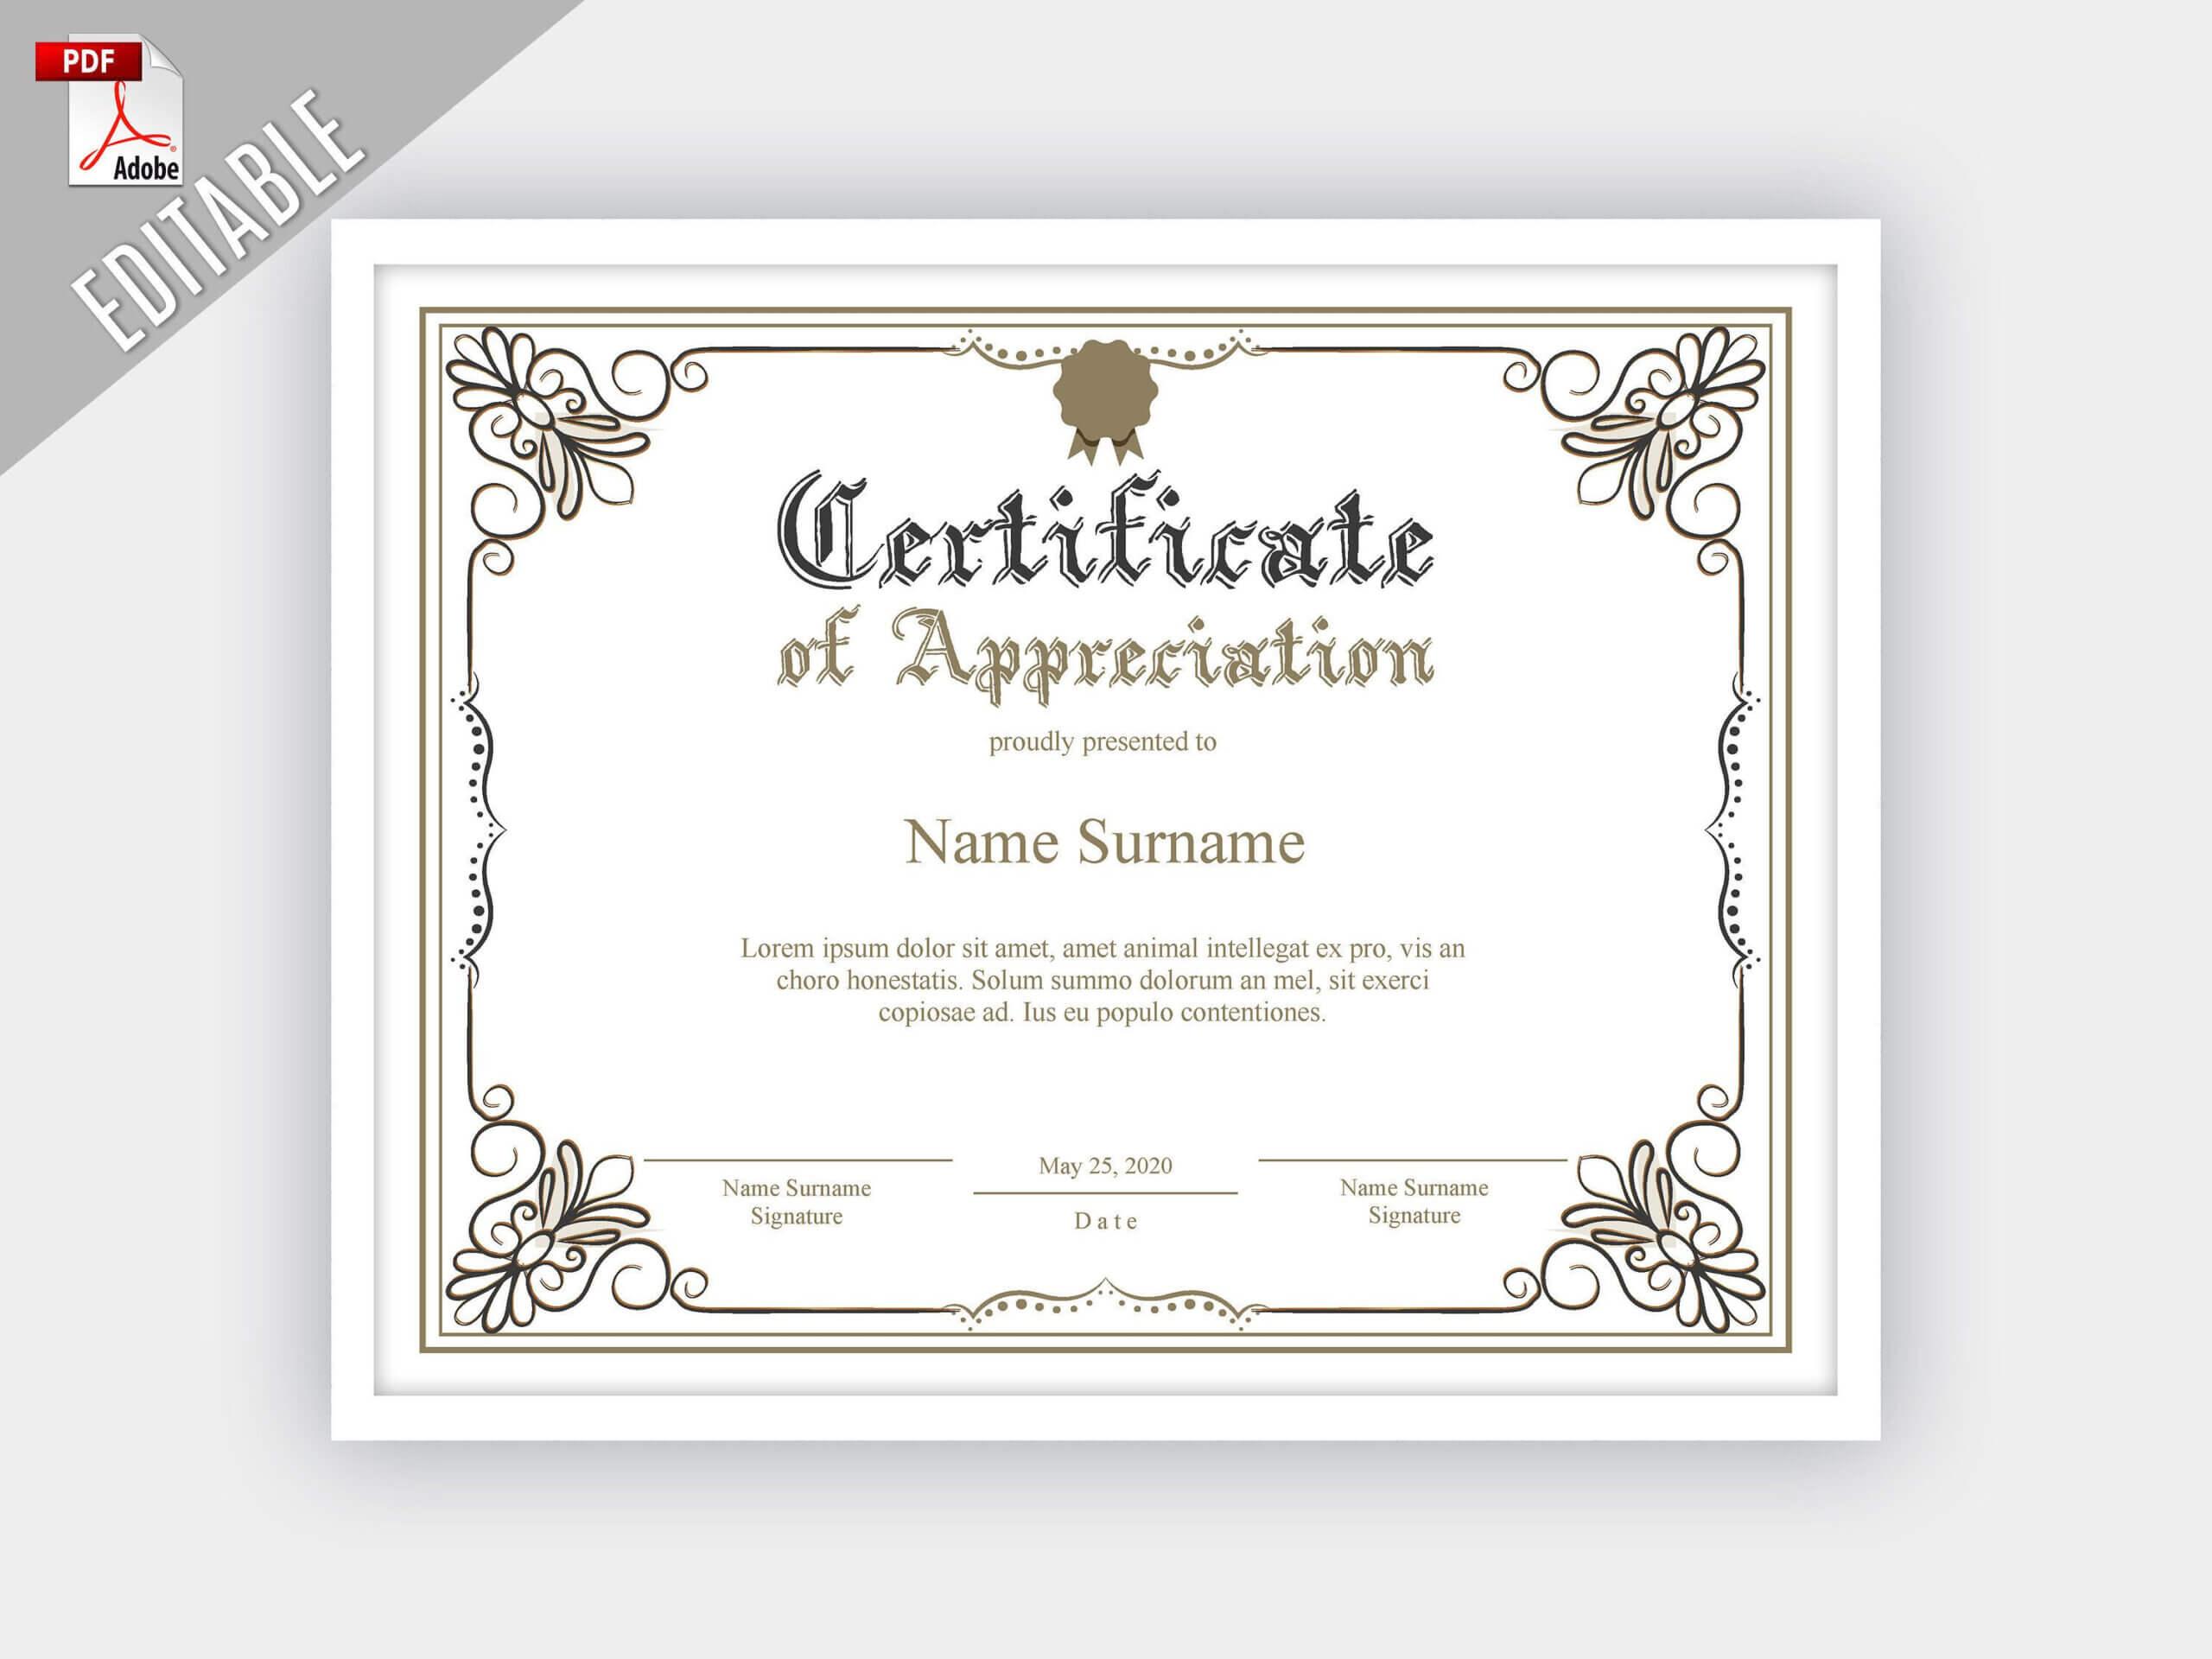 Printable Certificate Of Appreciation, Editable Certificate Regarding Update Certificates That Use Certificate Templates